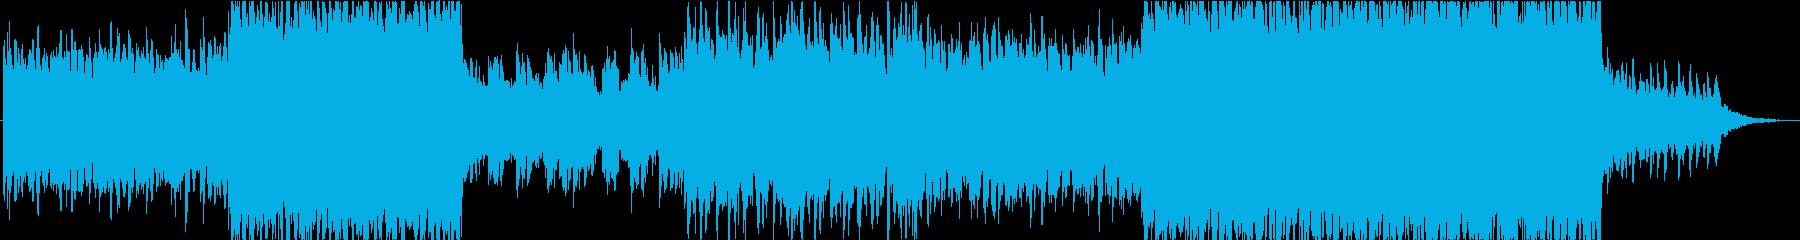 【BGM】透明感のあるJ-R&Bトラックの再生済みの波形